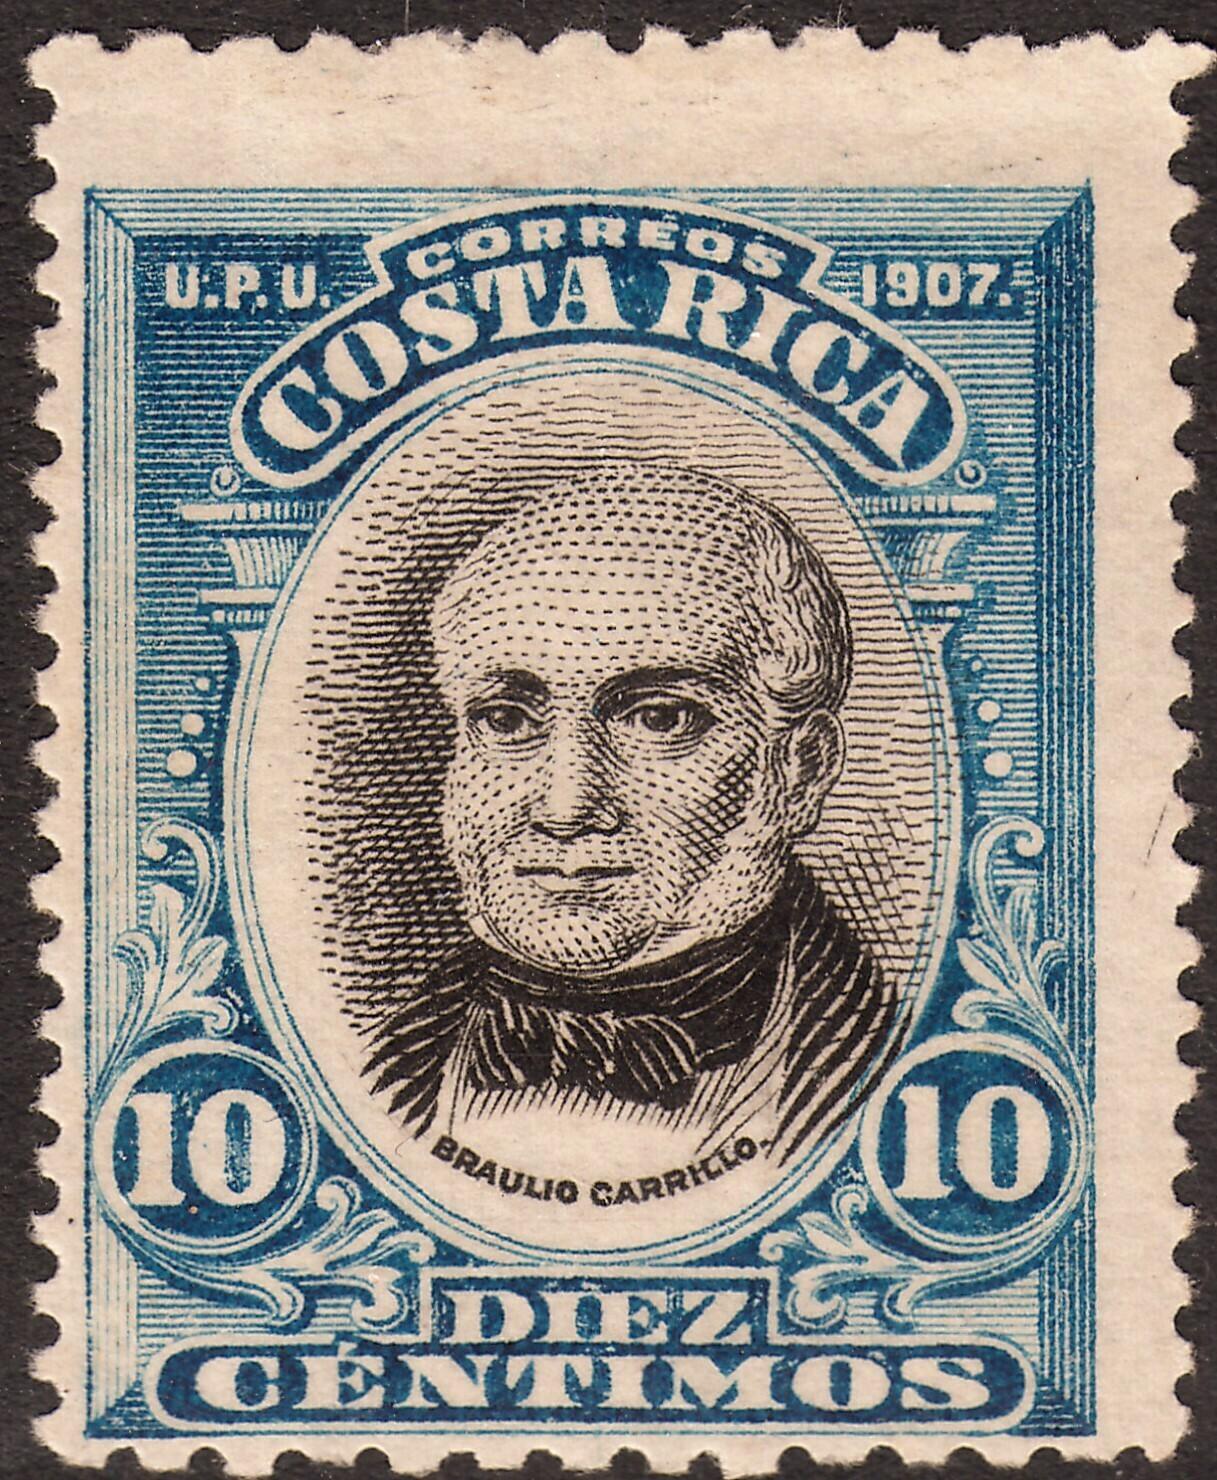 Costa Rica 1907 10c Black & Blue MH